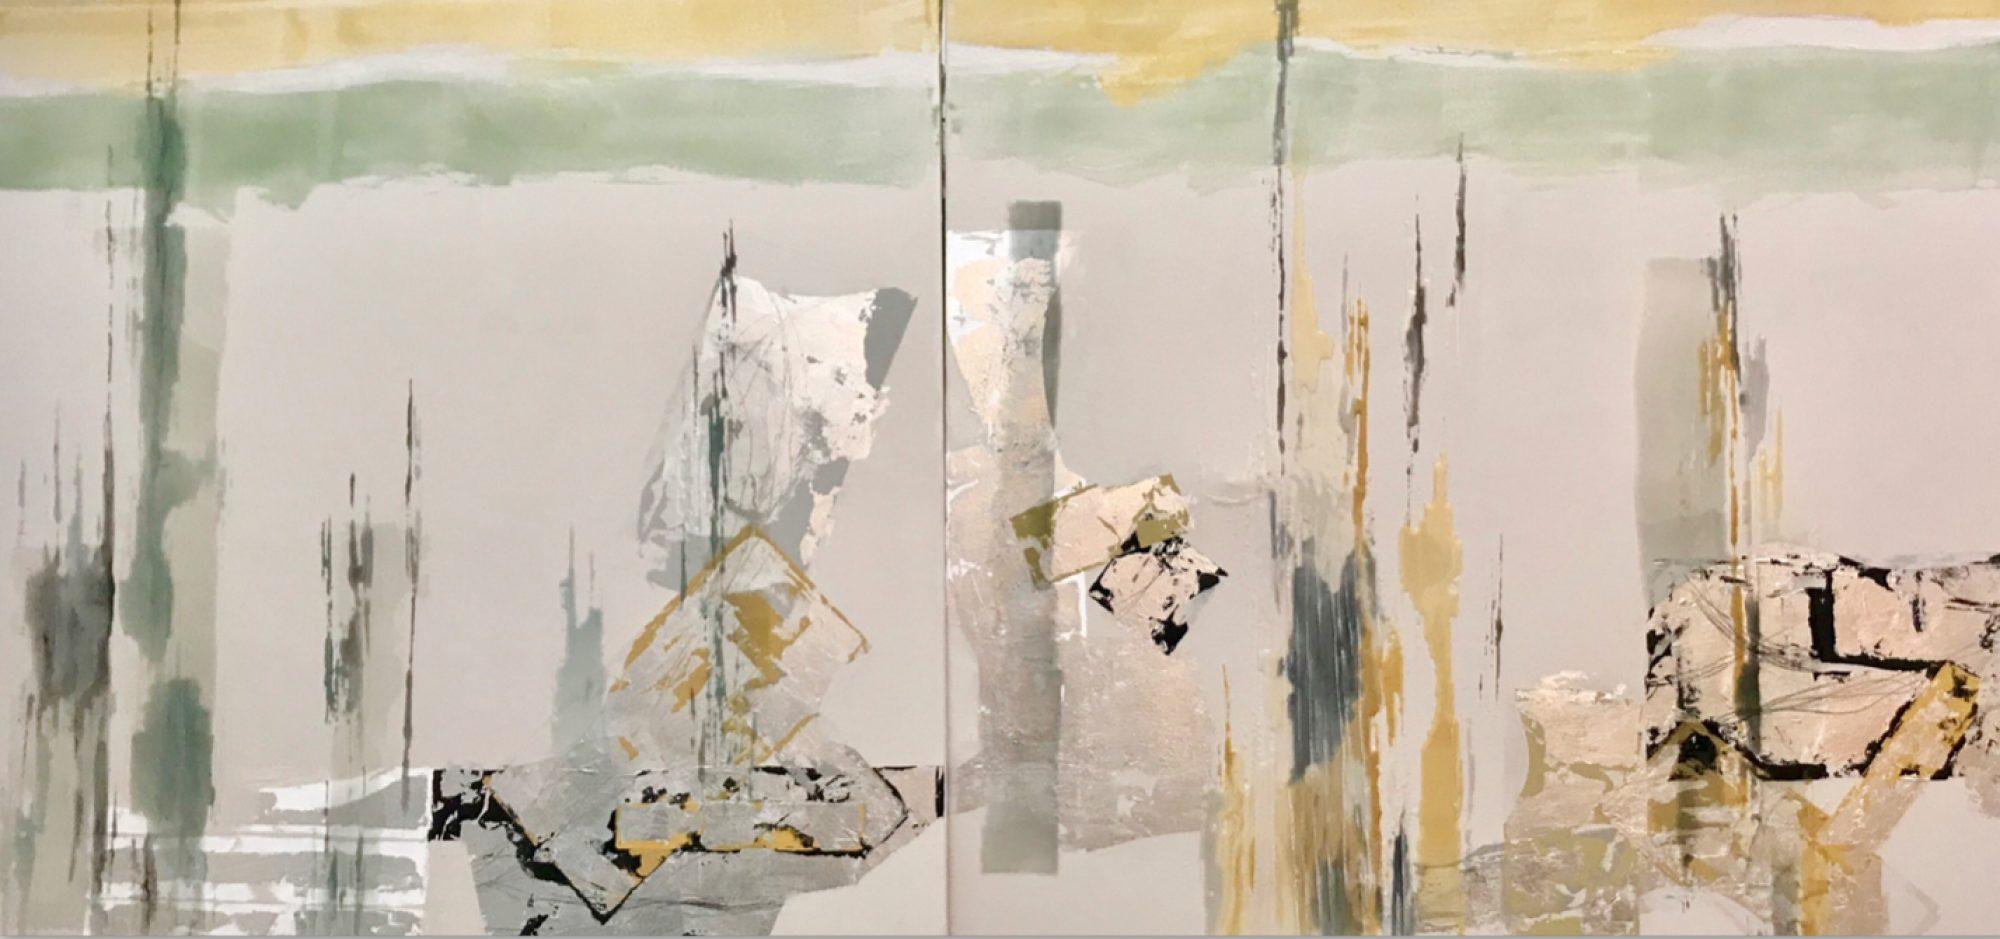 Analogía III. 2019. Resina sobre lienzo, 100 x 200cm.